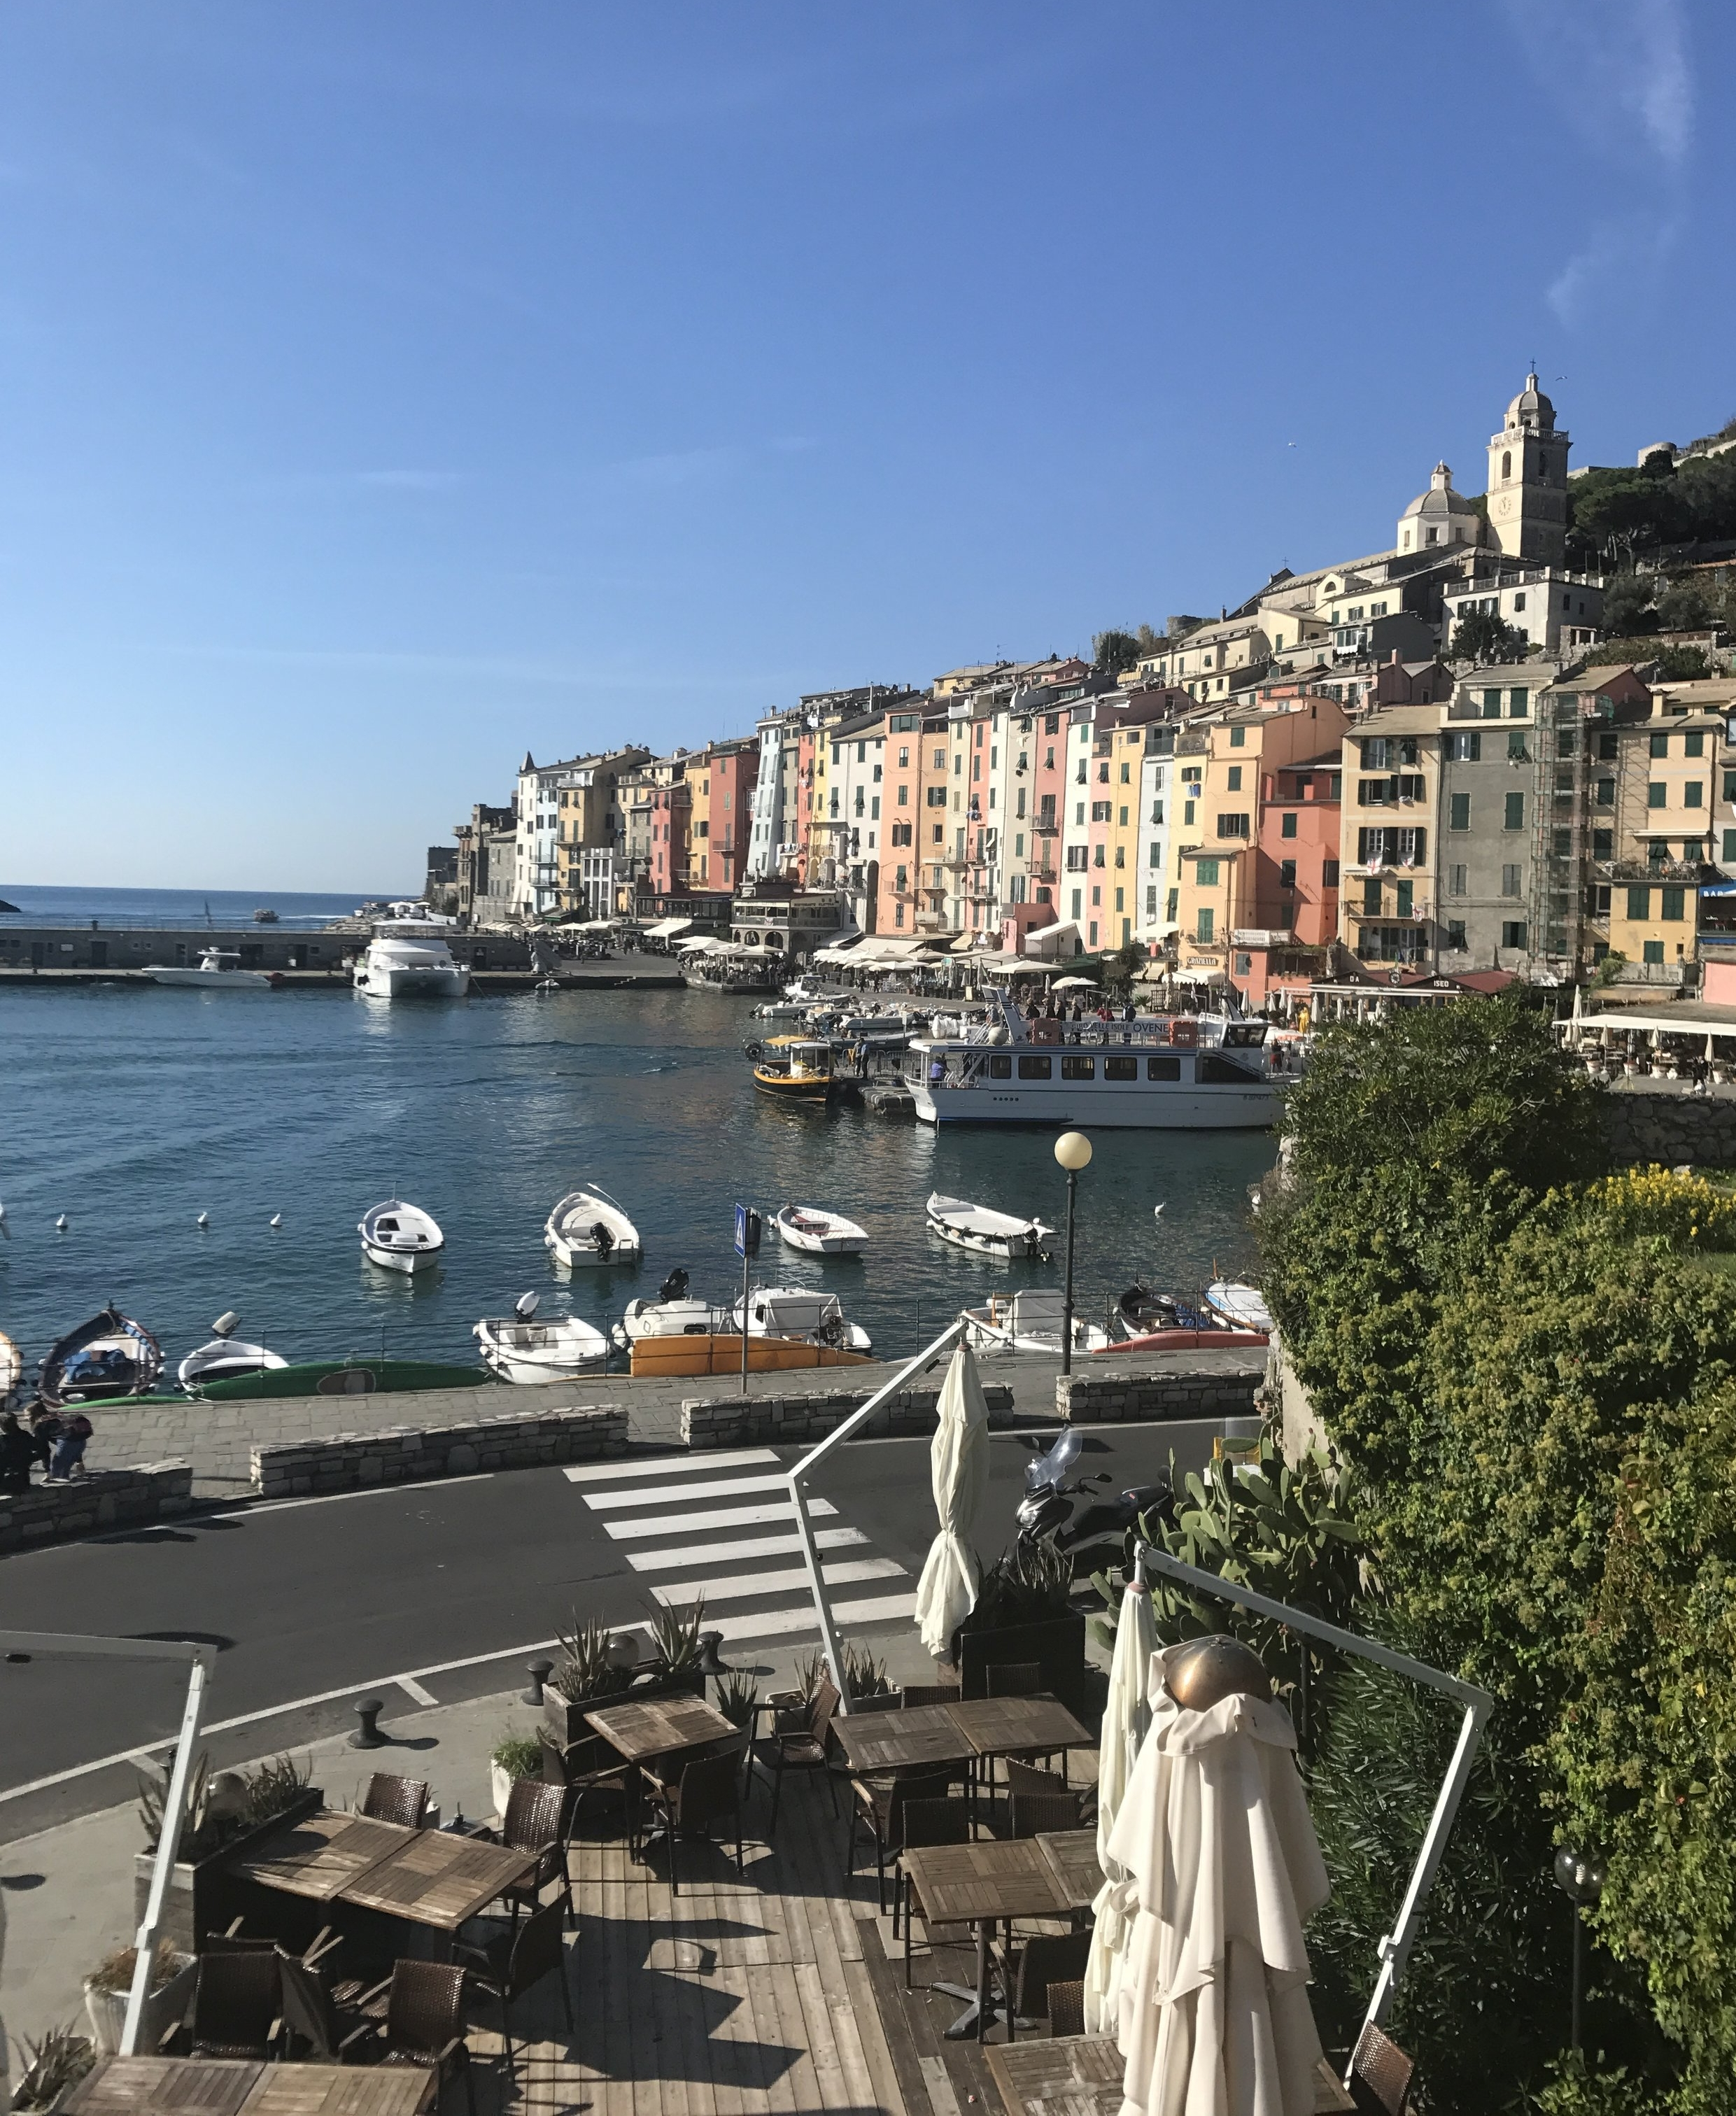 Portovenere in Liguria, Italy